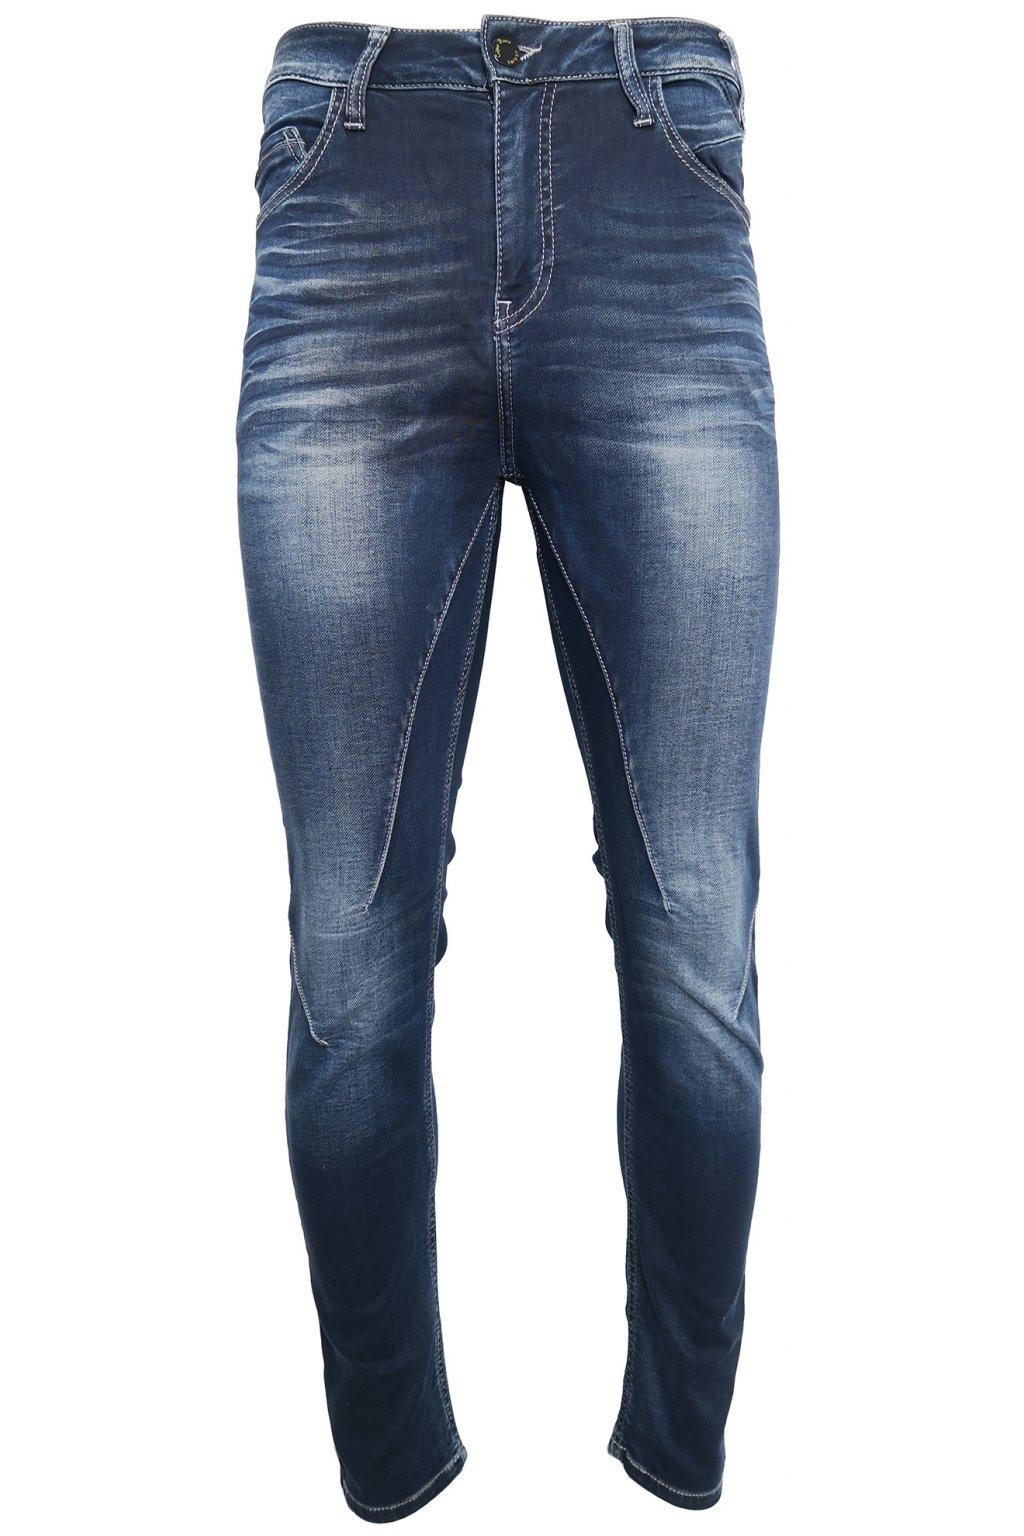 Tmavé uplé džíny Cipo & Baxx